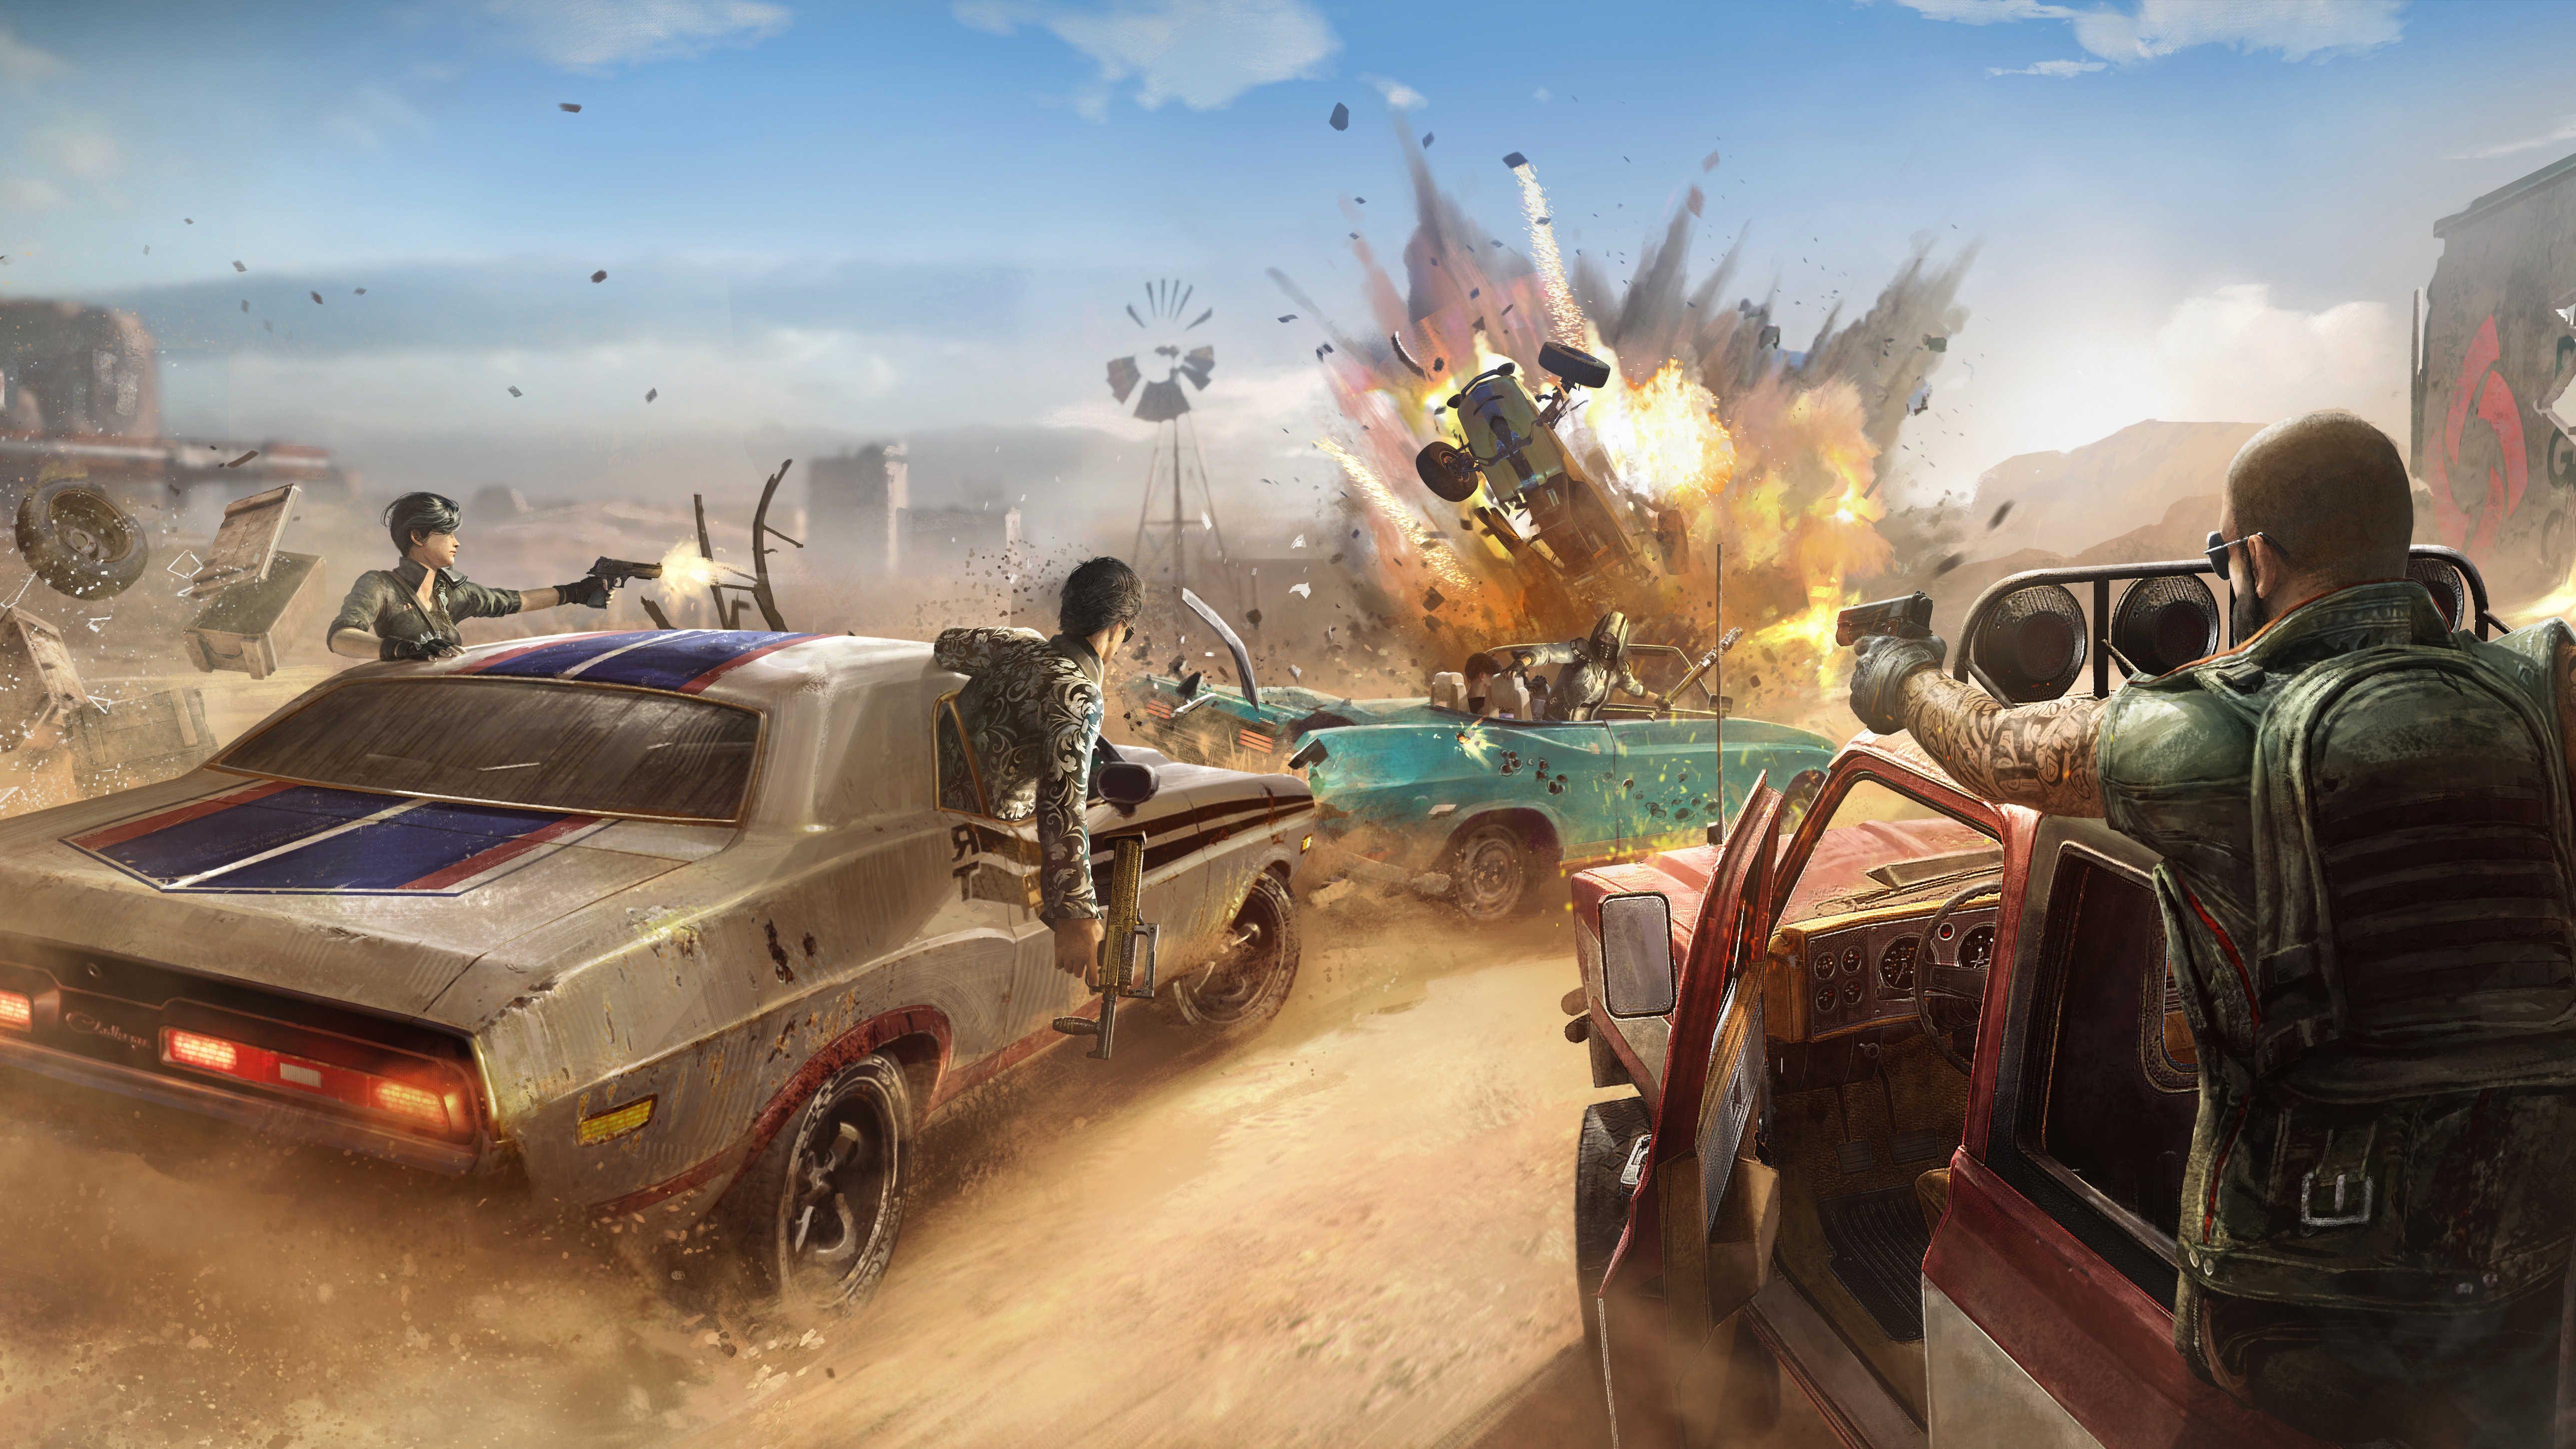 Playerunknowns Battlegrounds 4k Mobile Hd Wallpapers